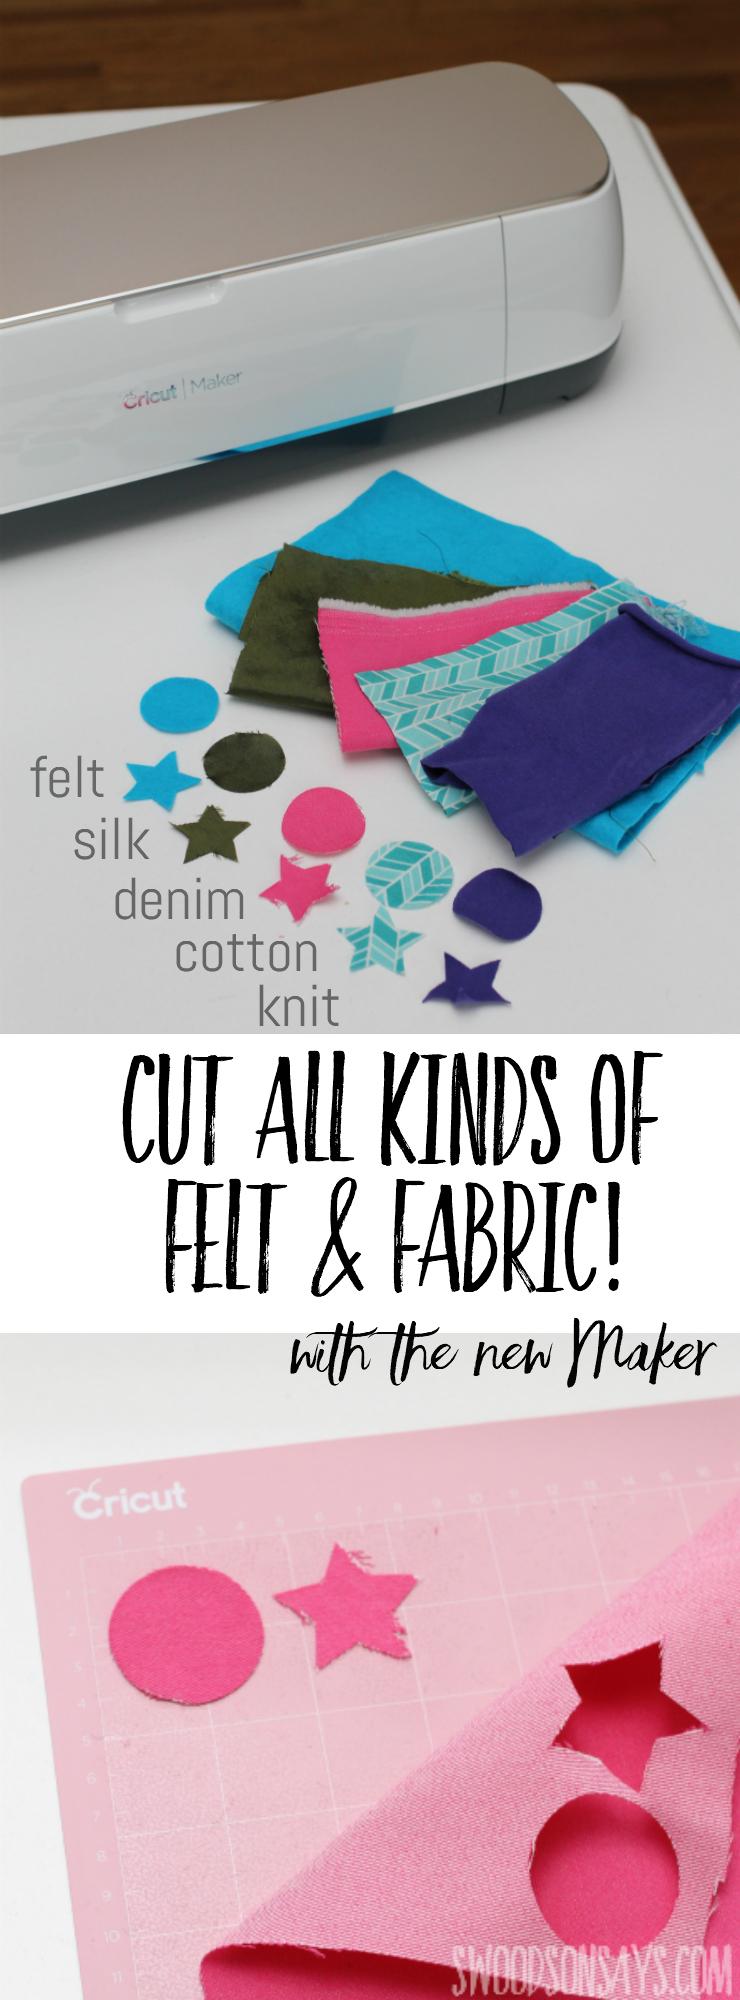 Cricut Maker Review - It Cuts Fabric! - Swoodson Says